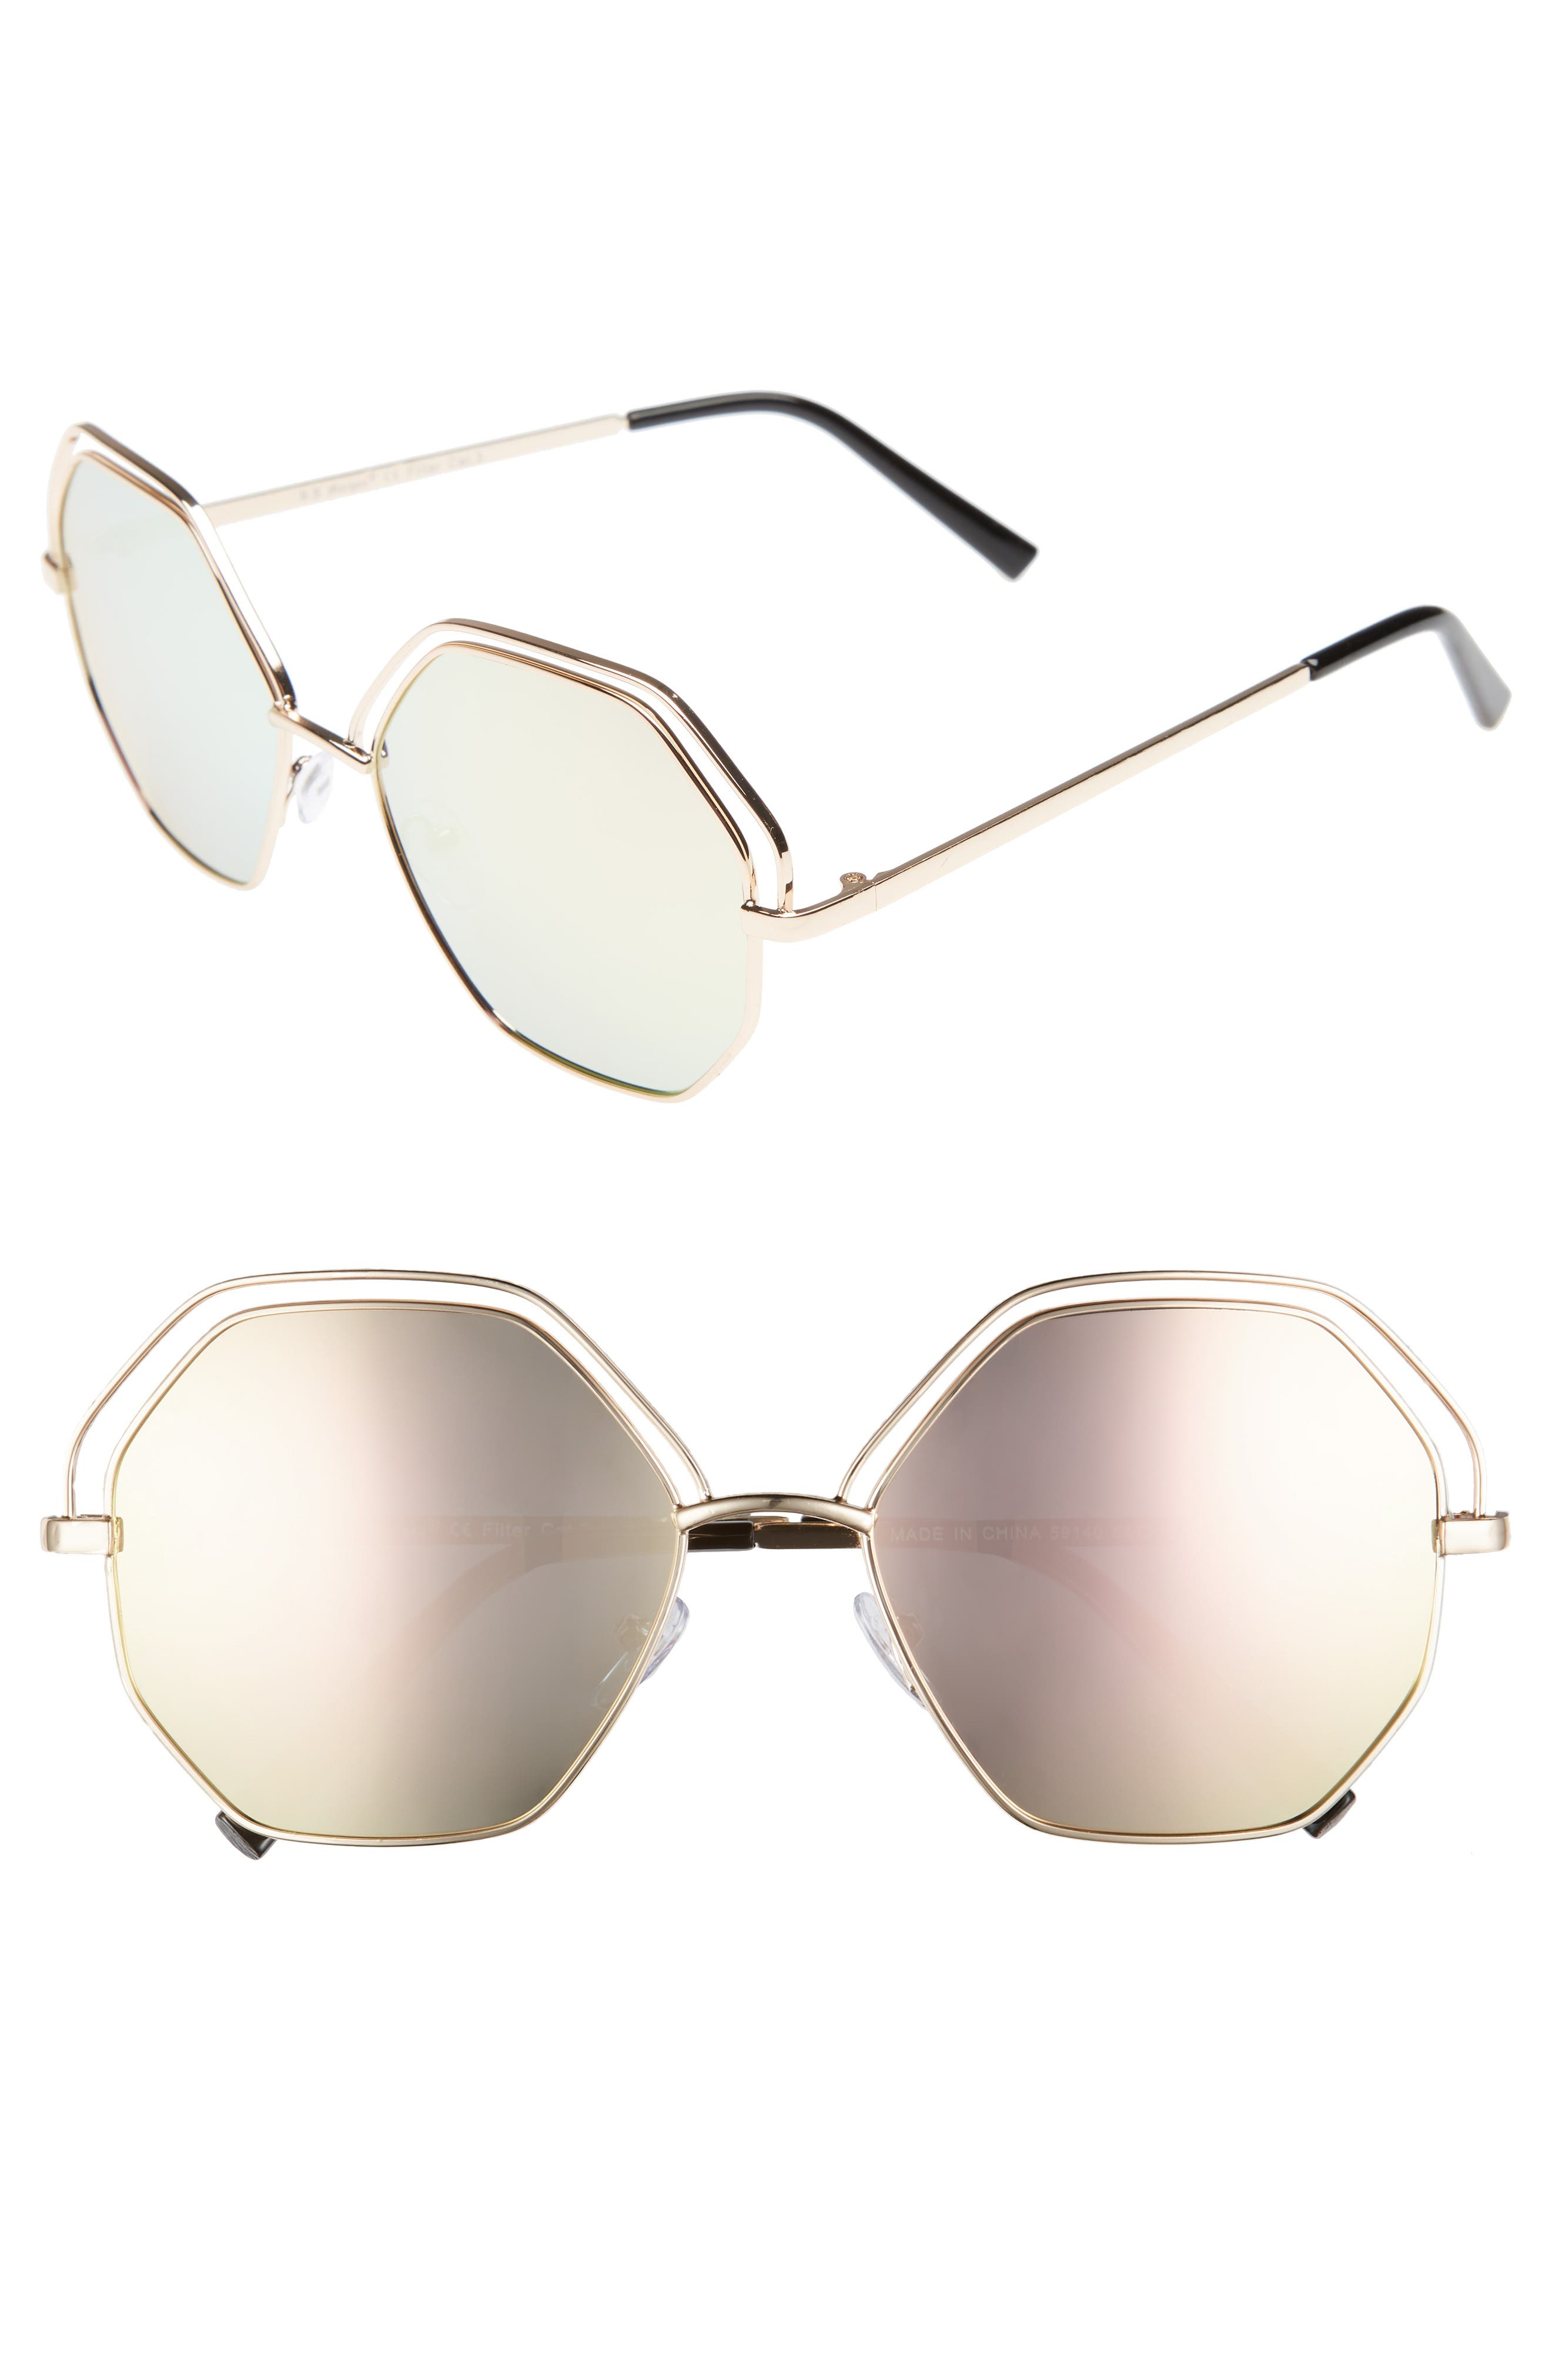 A.J. Morgan Minx 56mm Mirrored Round Sunglasses